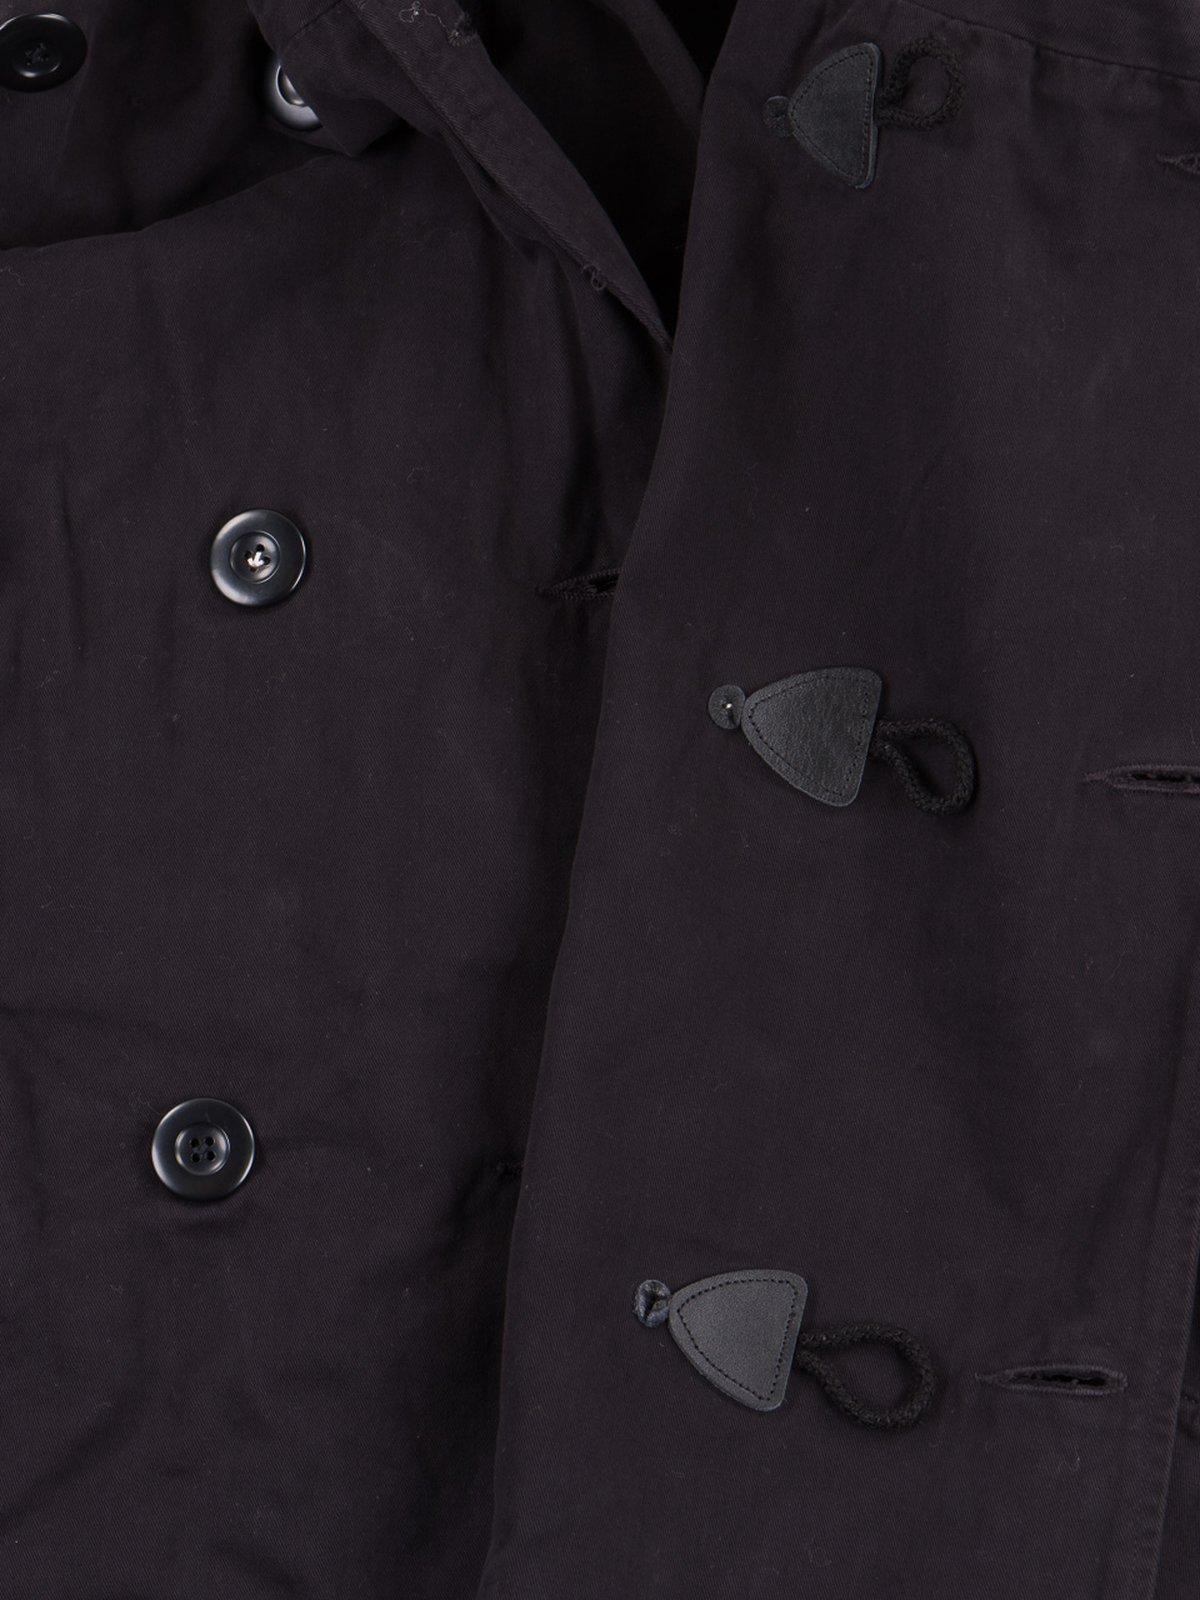 Black Brushed Twill Tri–P Ring Coat - Image 4